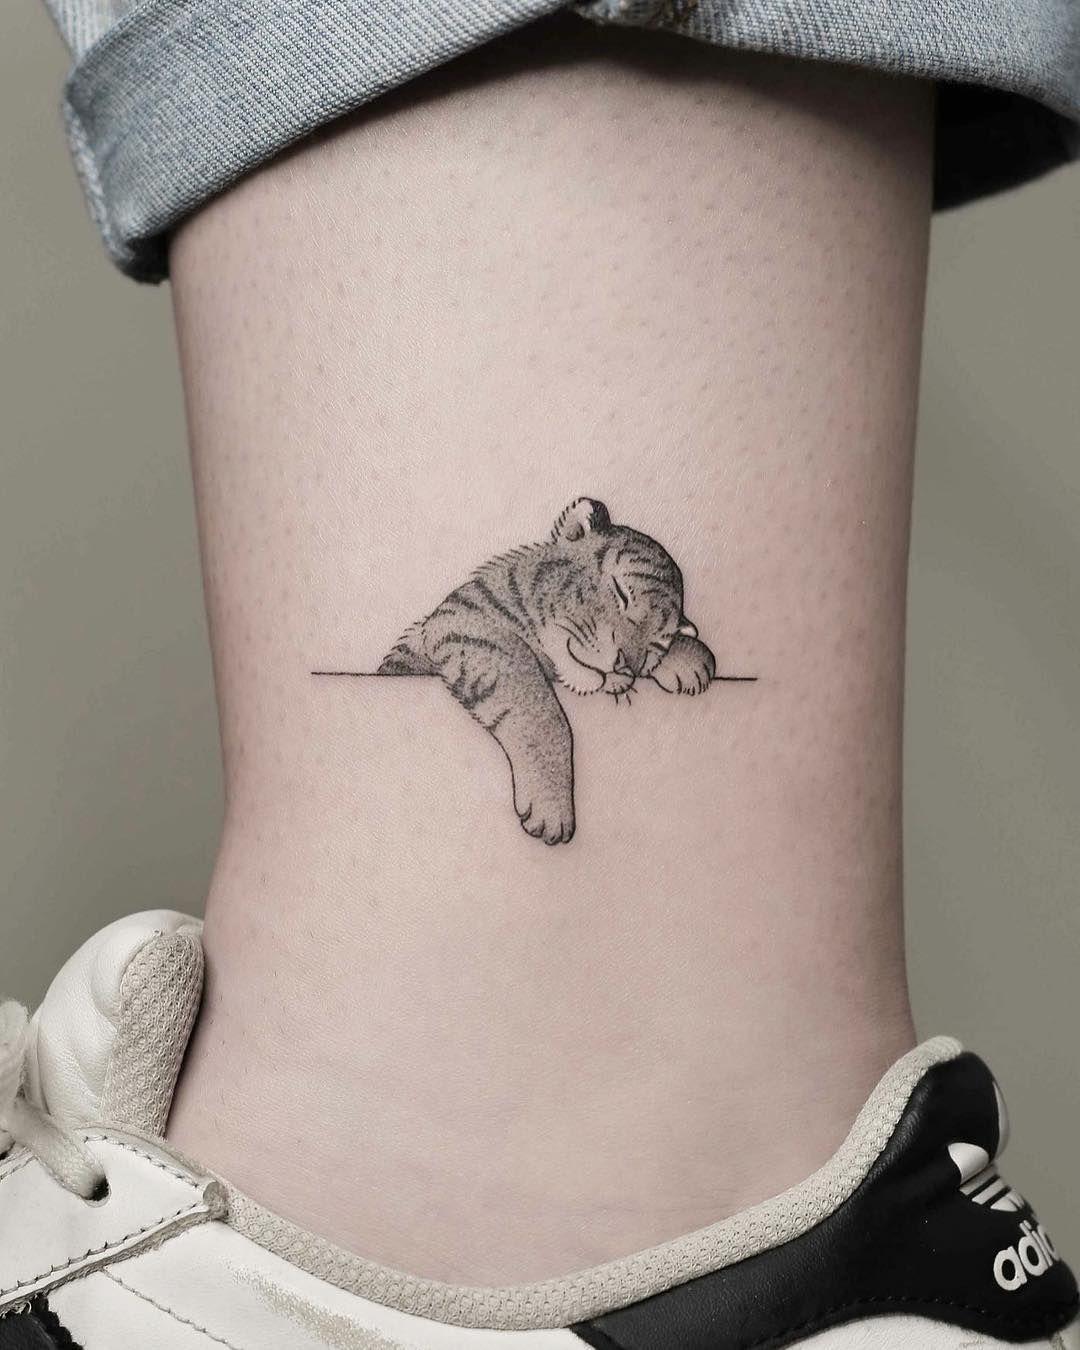 Pin By Christine Jarmer On Tats I Like: Pin Adăugat De Christine C Pe Tatuaje